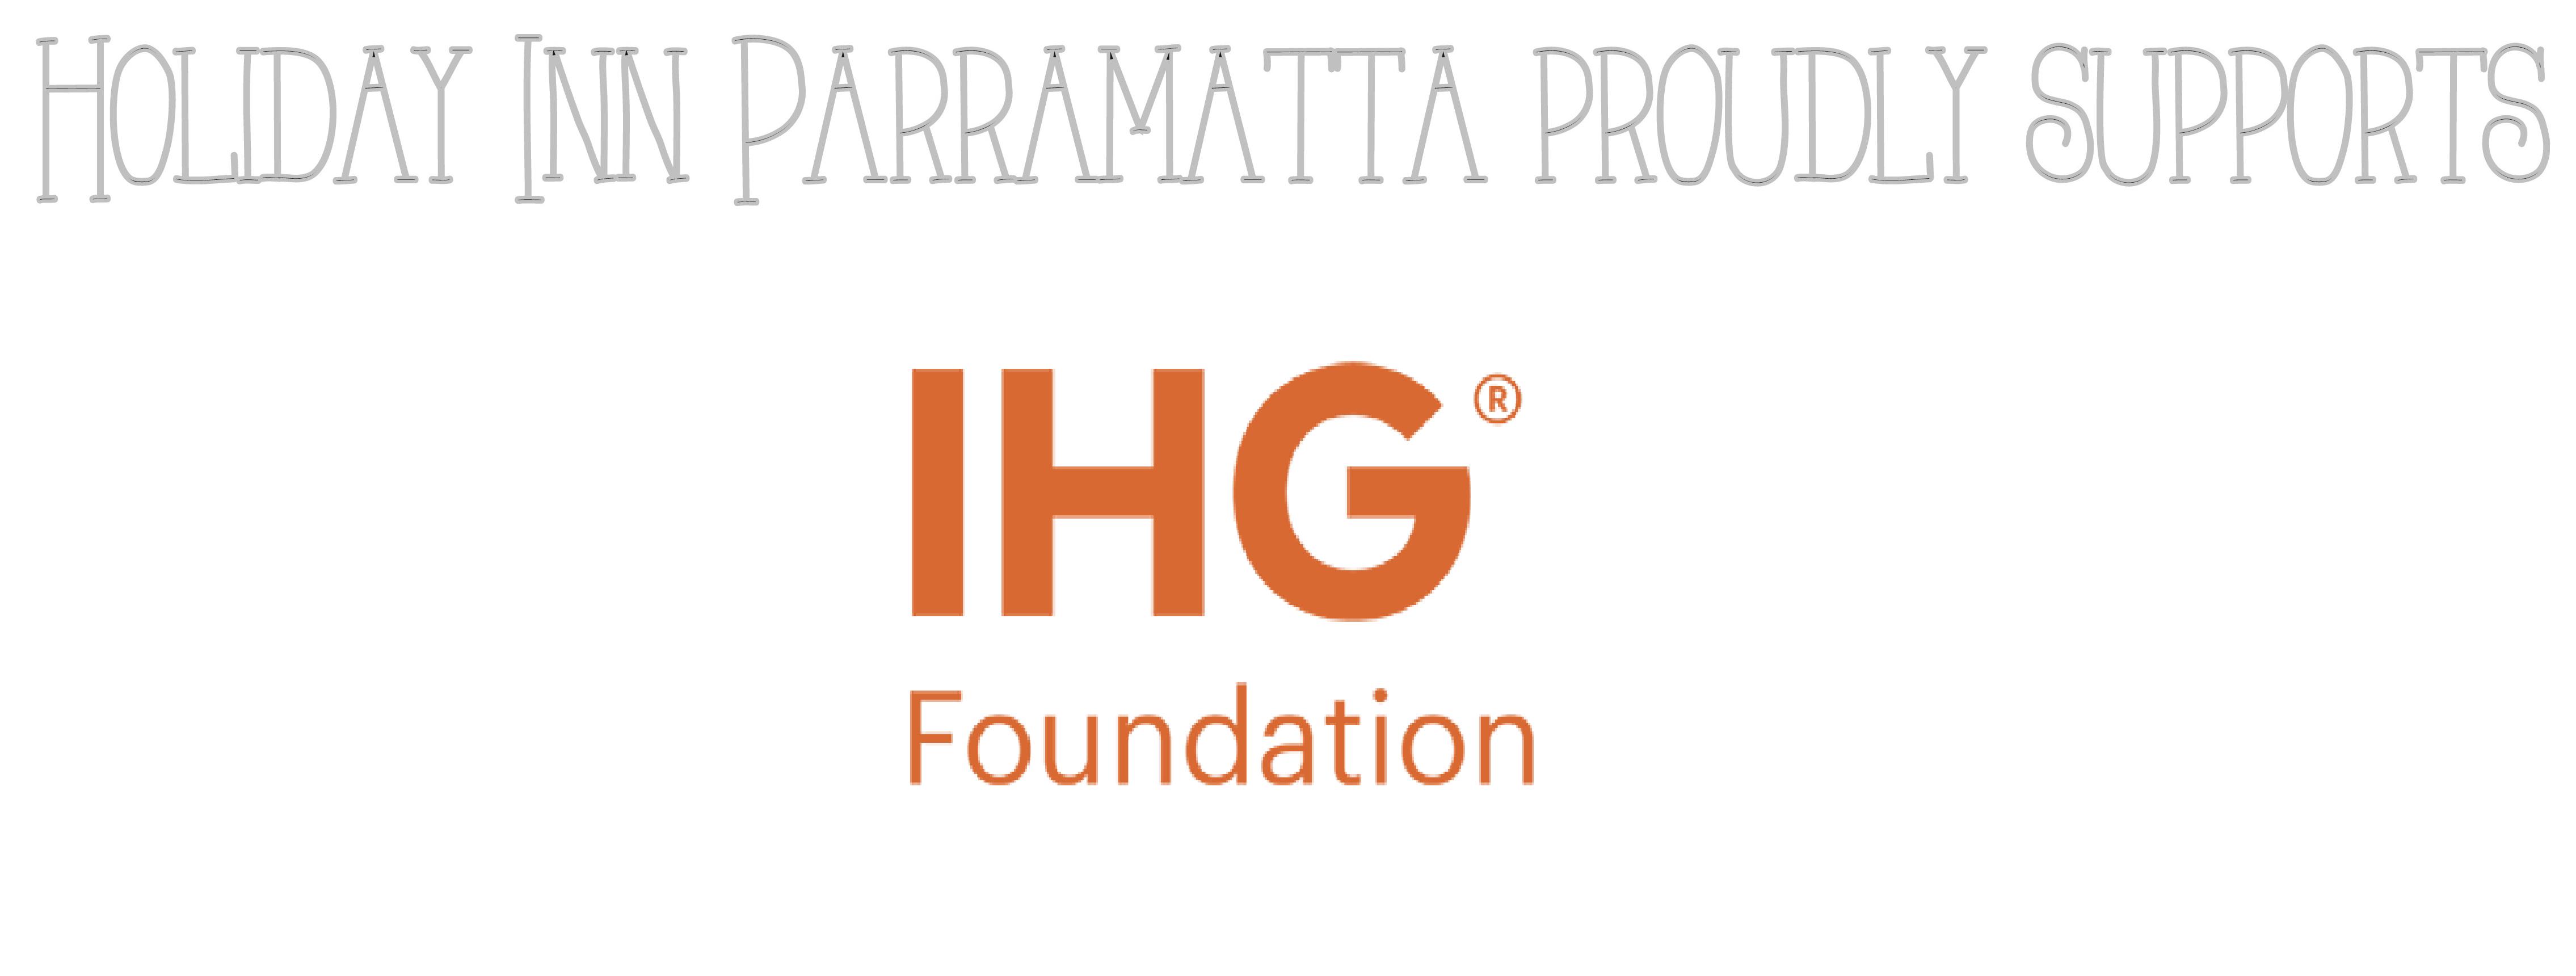 ihg foundation